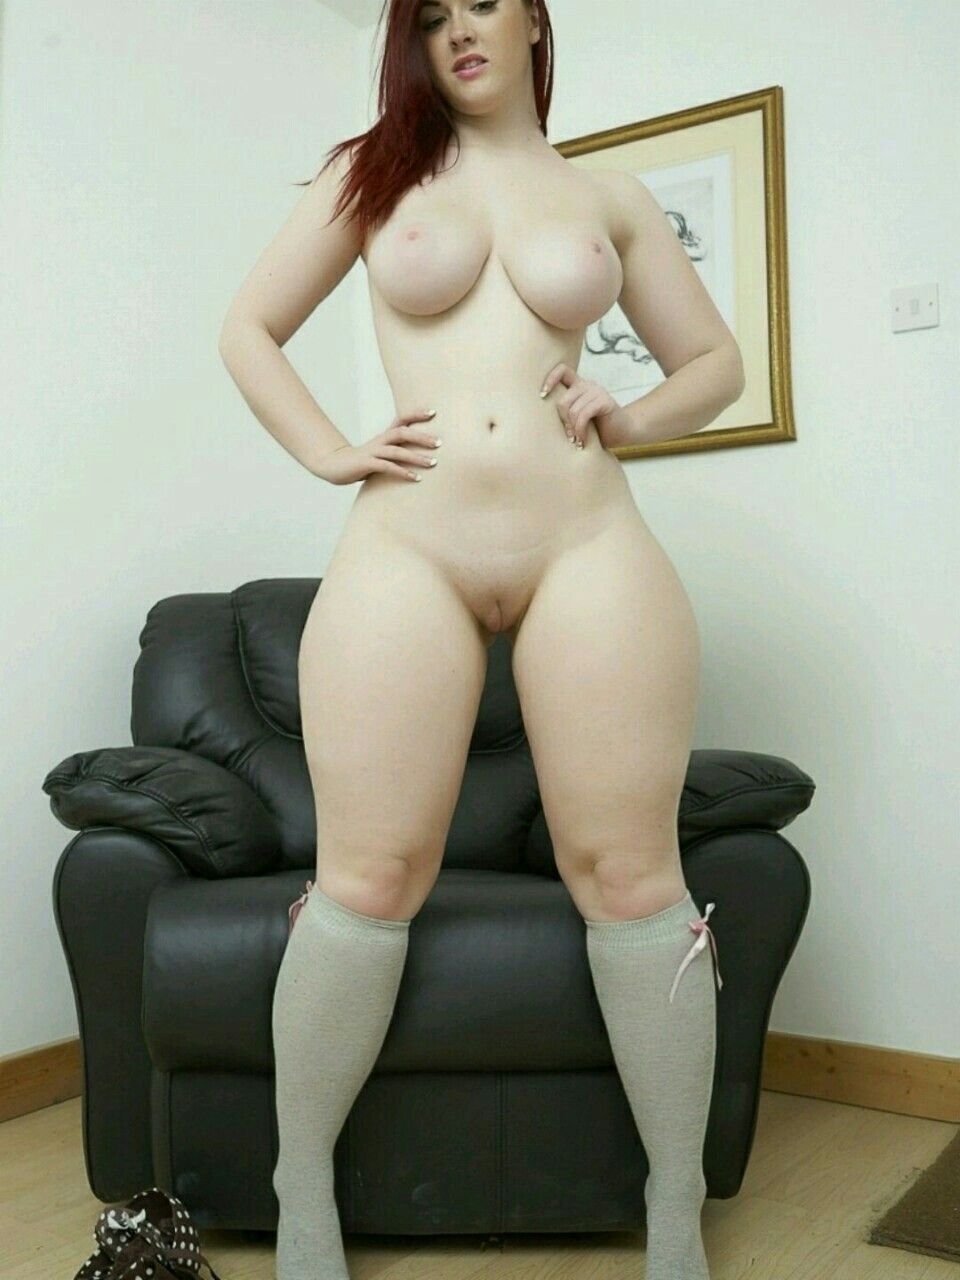 Giant Tits Small Waist Big Ass